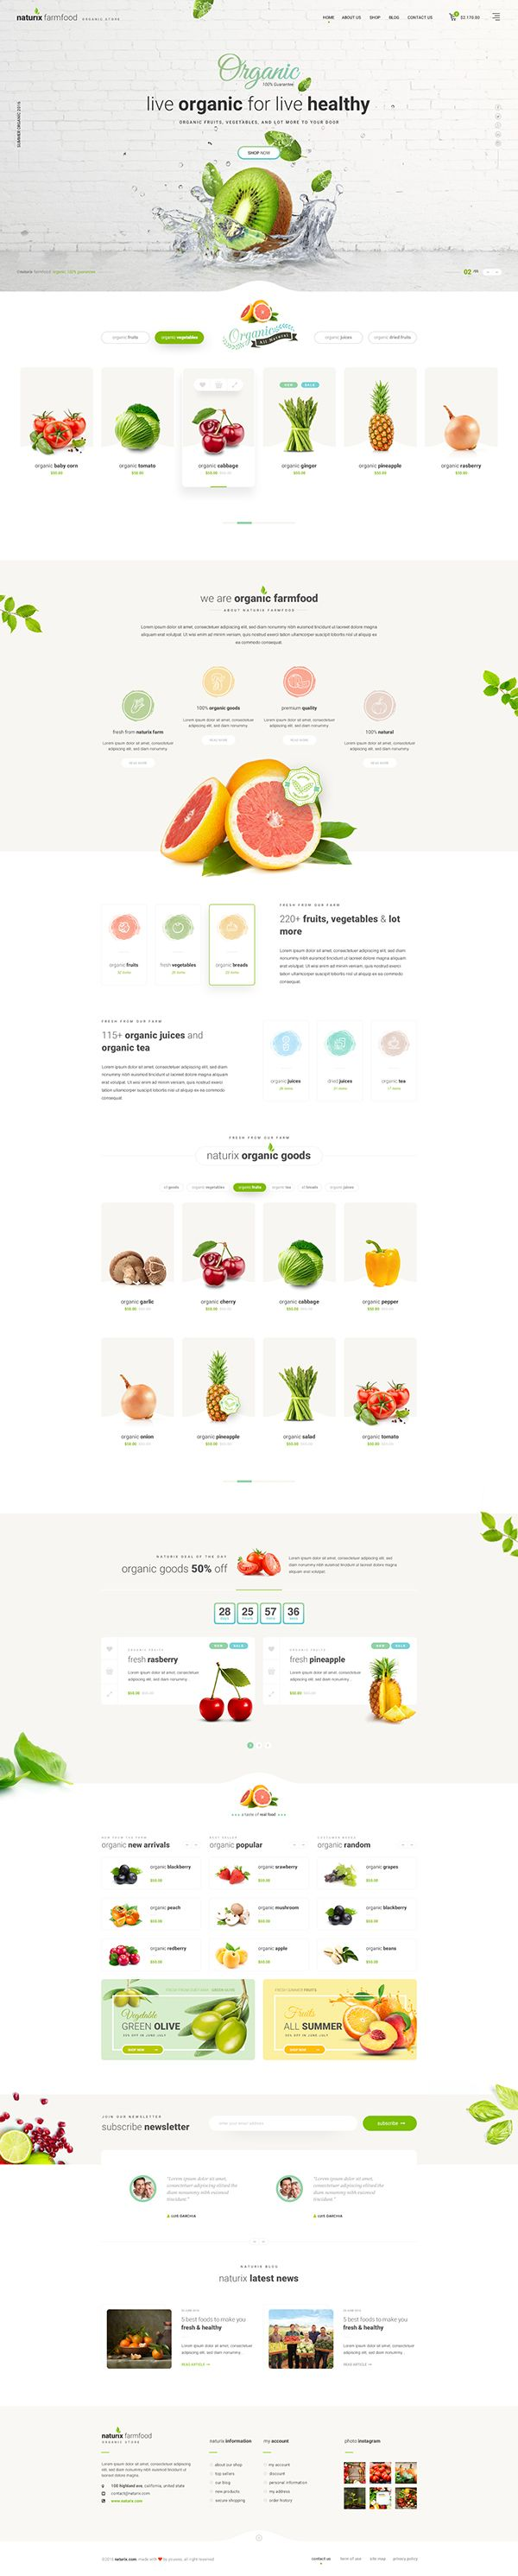 Naturix - Organic Store PSD TemplateDownload Here : https://themeforest.net/item/naturix-organic-store-psd-template/19184061